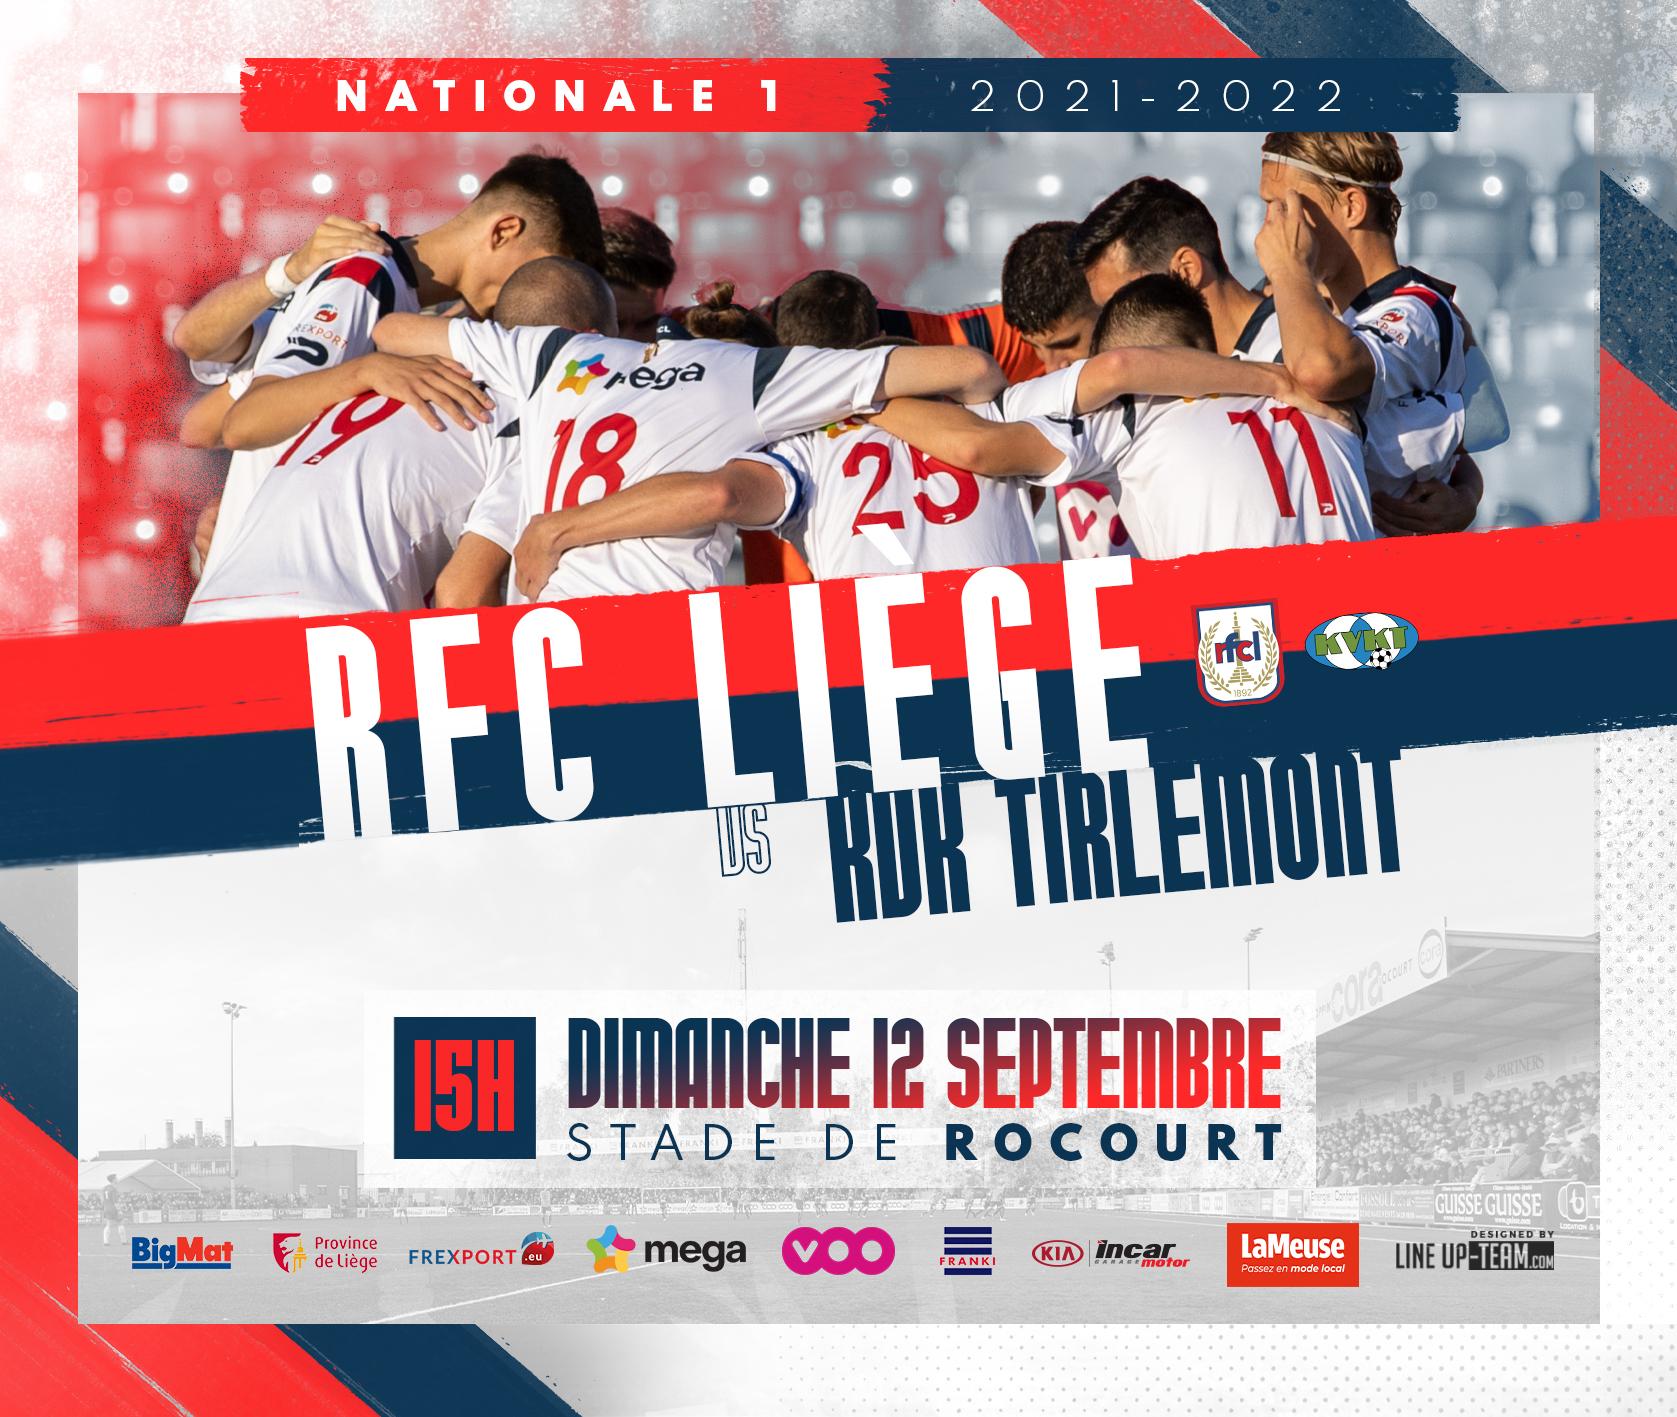 Billetterie | RFC Liège-Tirlemont (12/09)